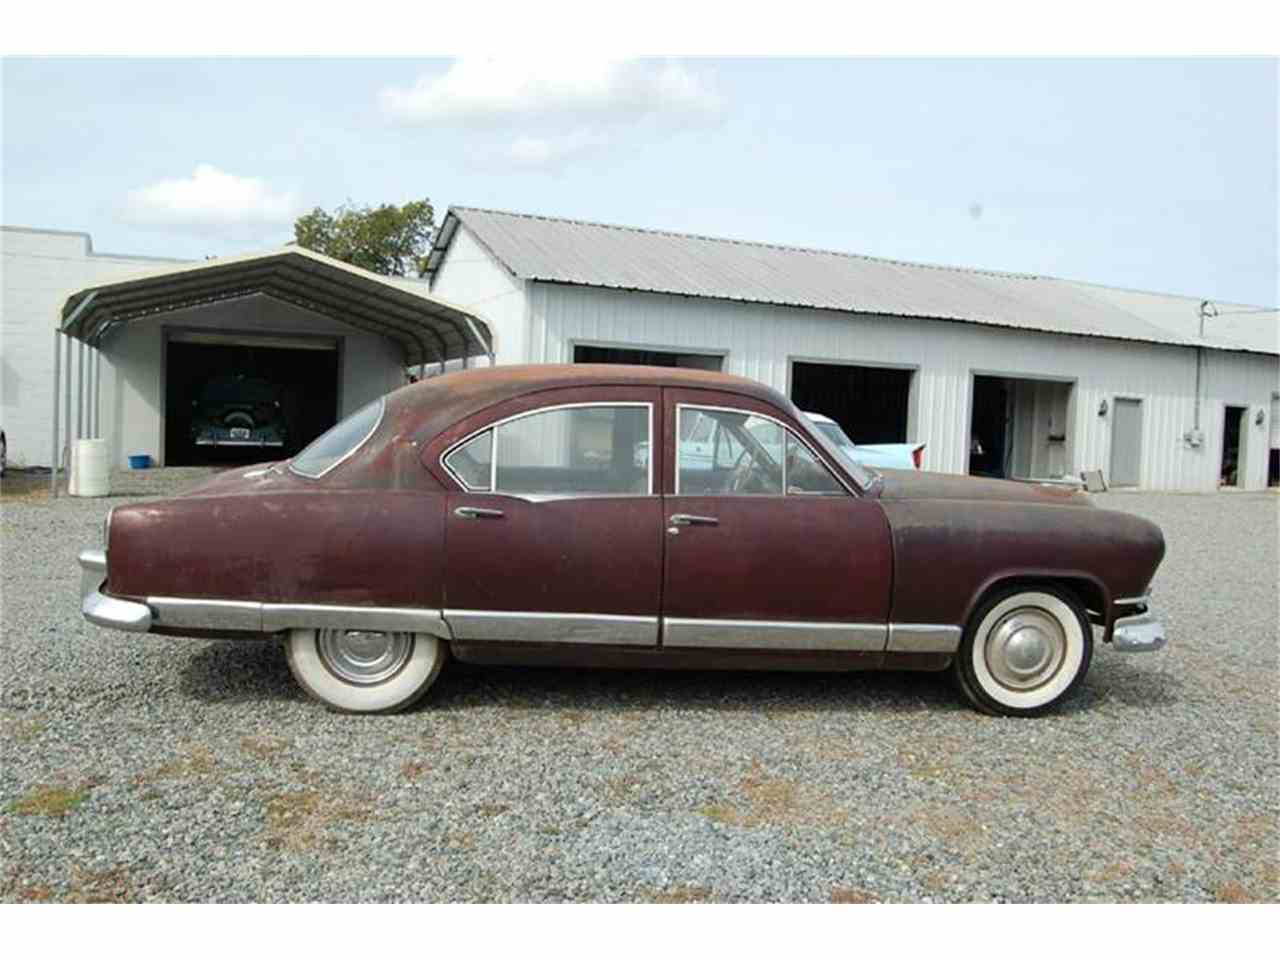 1951 Kaiser Deluxe 4 Door Sedan for Sale | ClassicCars.com | CC-921213